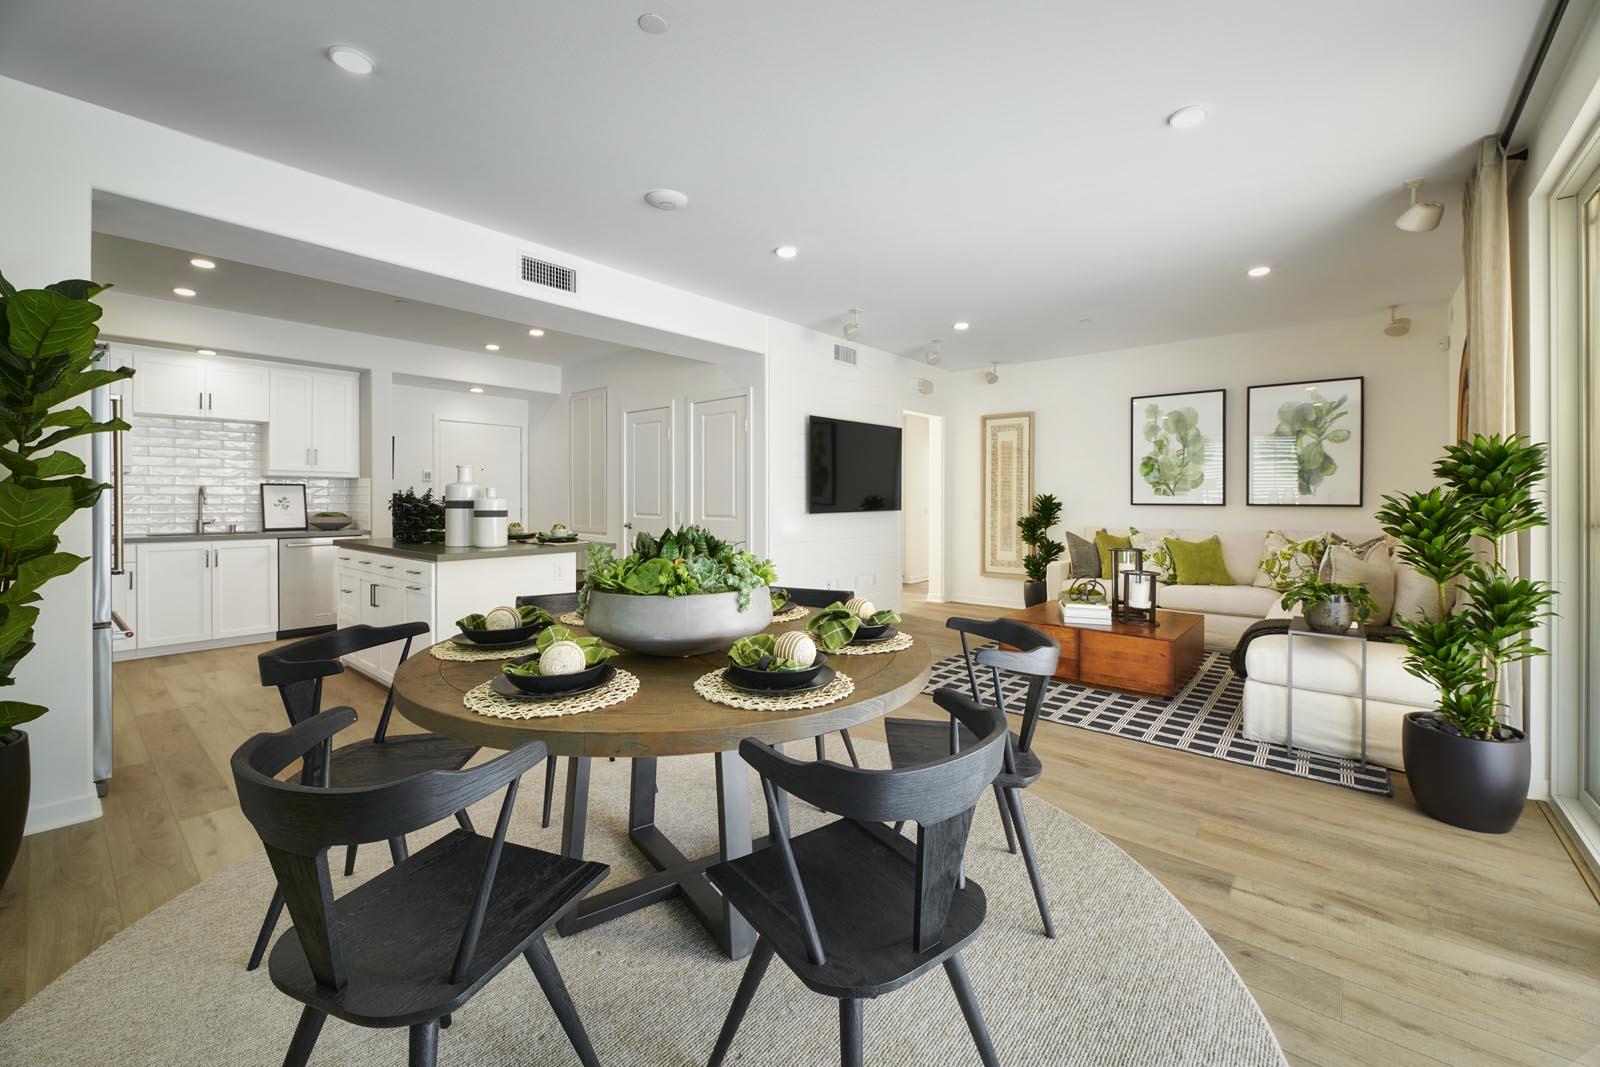 Dining Area   Residence 3   Aspire   New Homes in Rancho Cucamonga, CA   Van Daele Homes